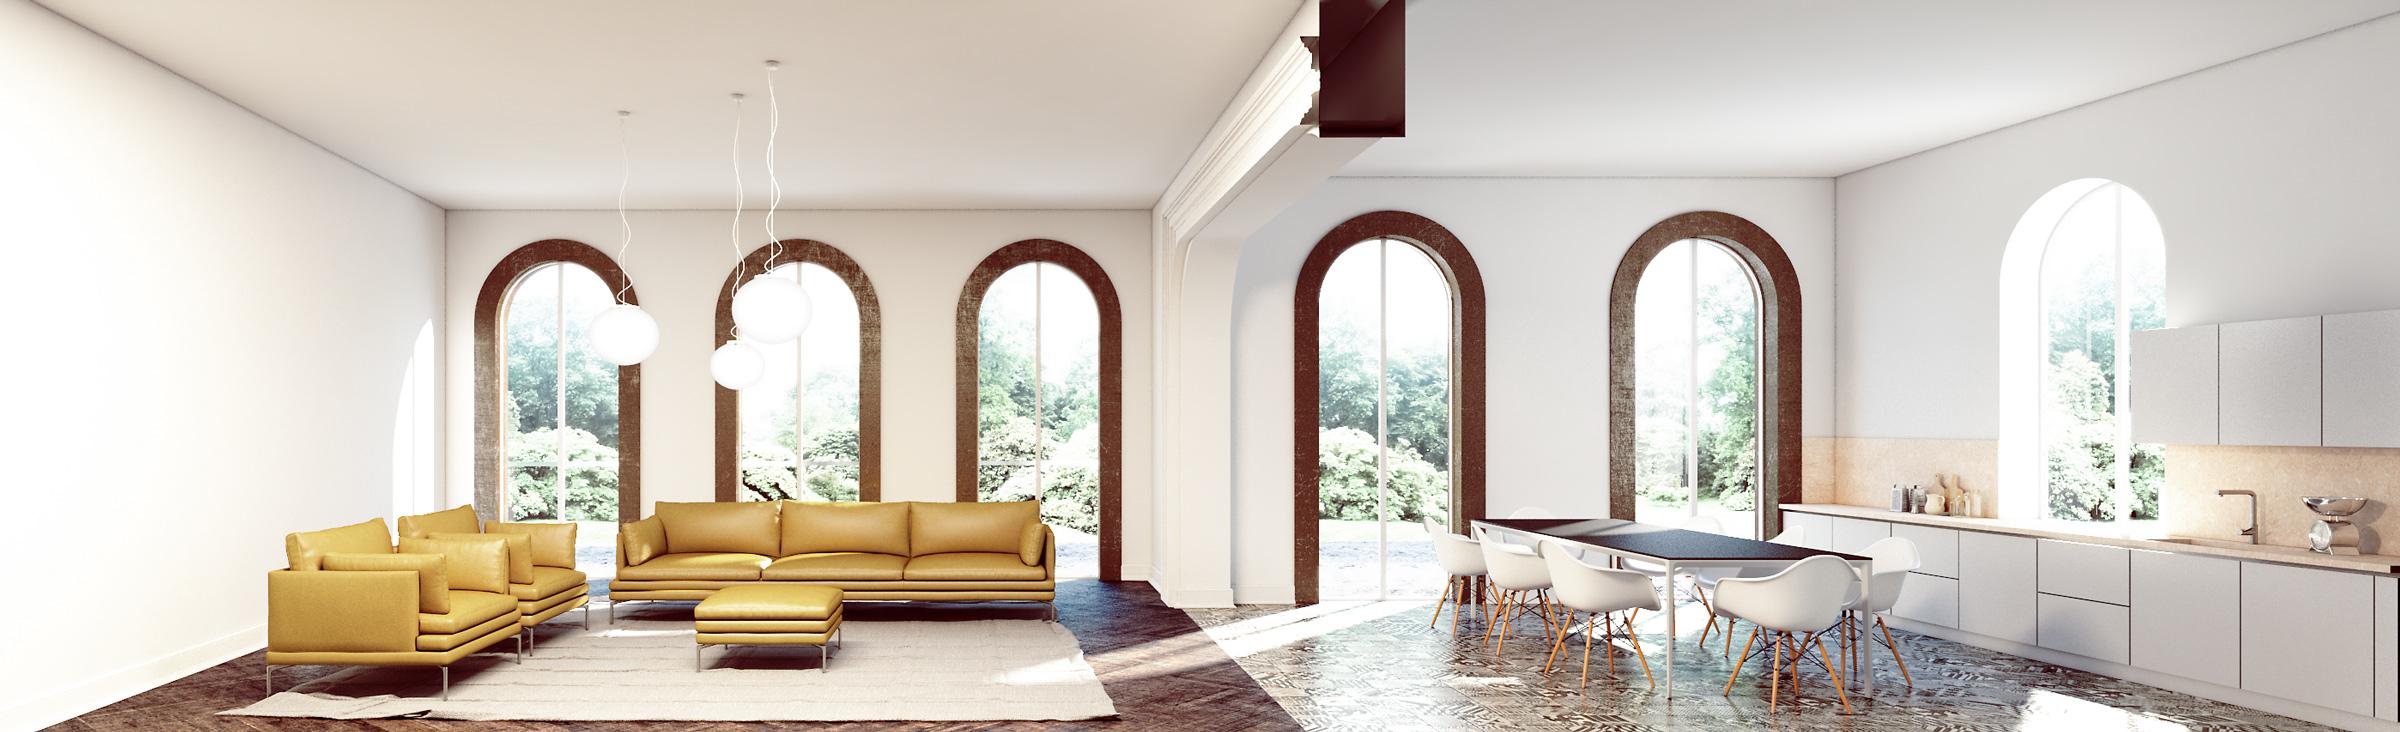 render-residence-sirmione-lago-livingroom-white-light-bright-parquet-cucina-kitchen